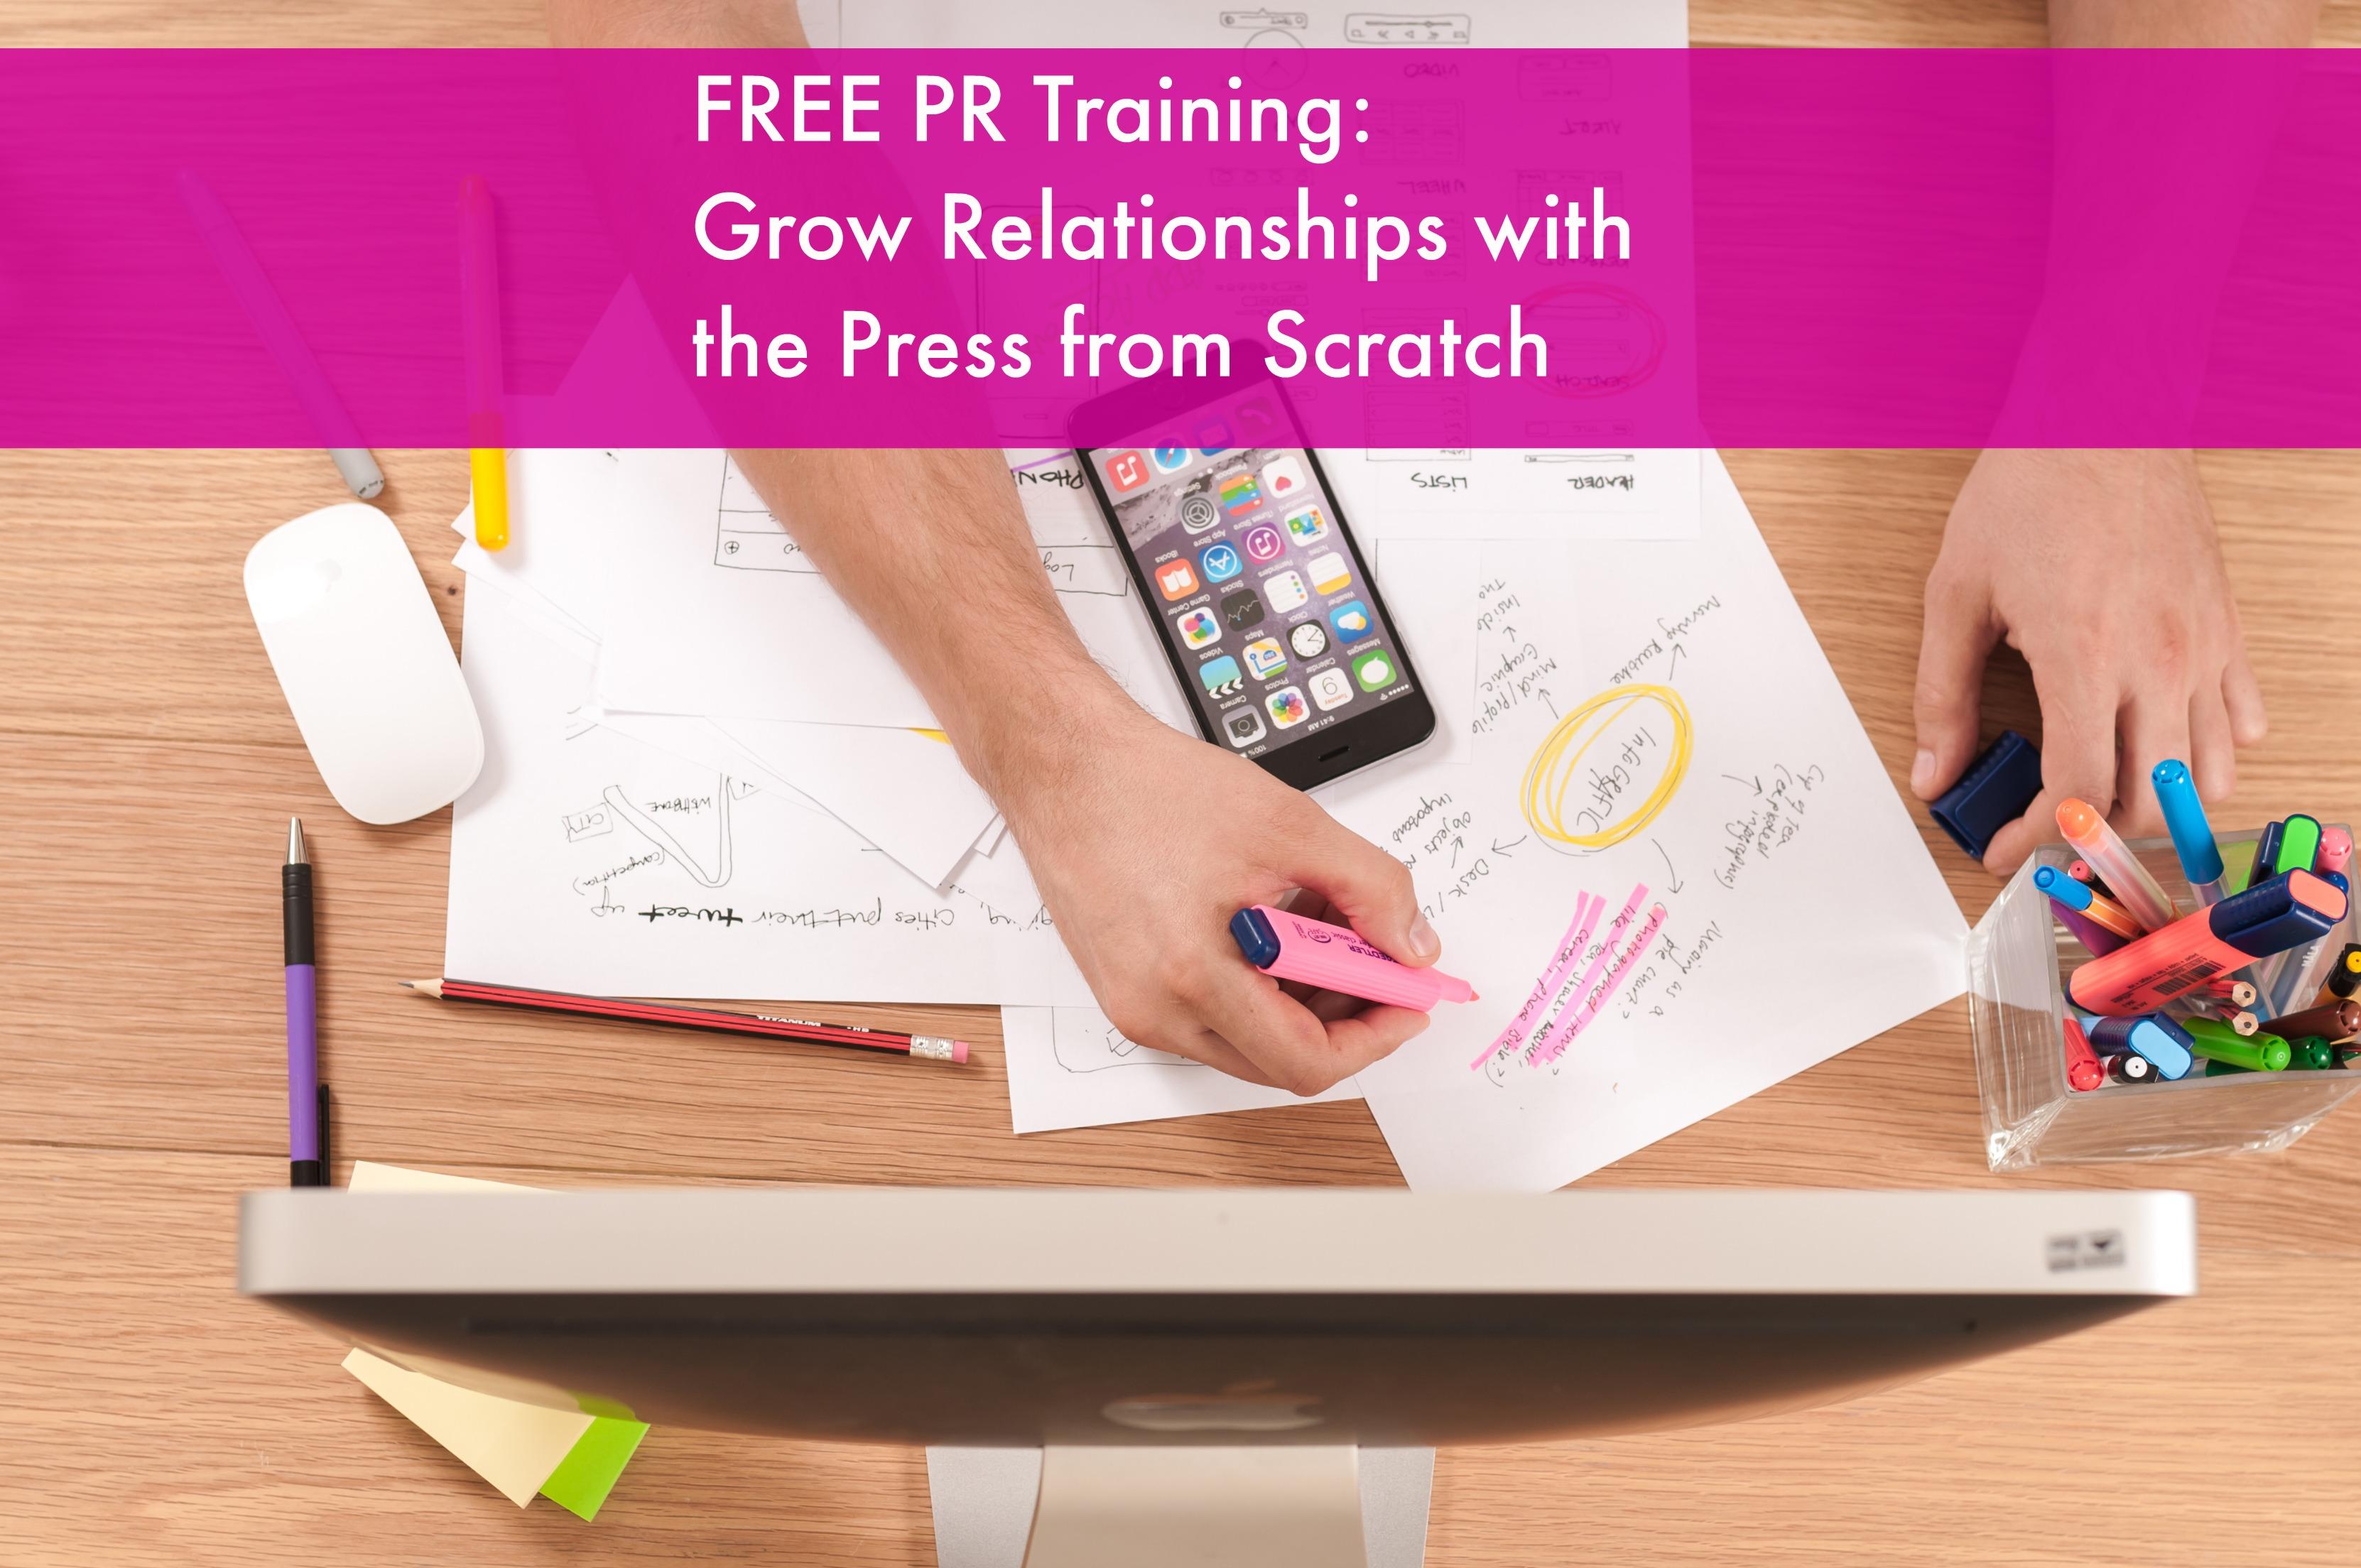 PR Training Relationships